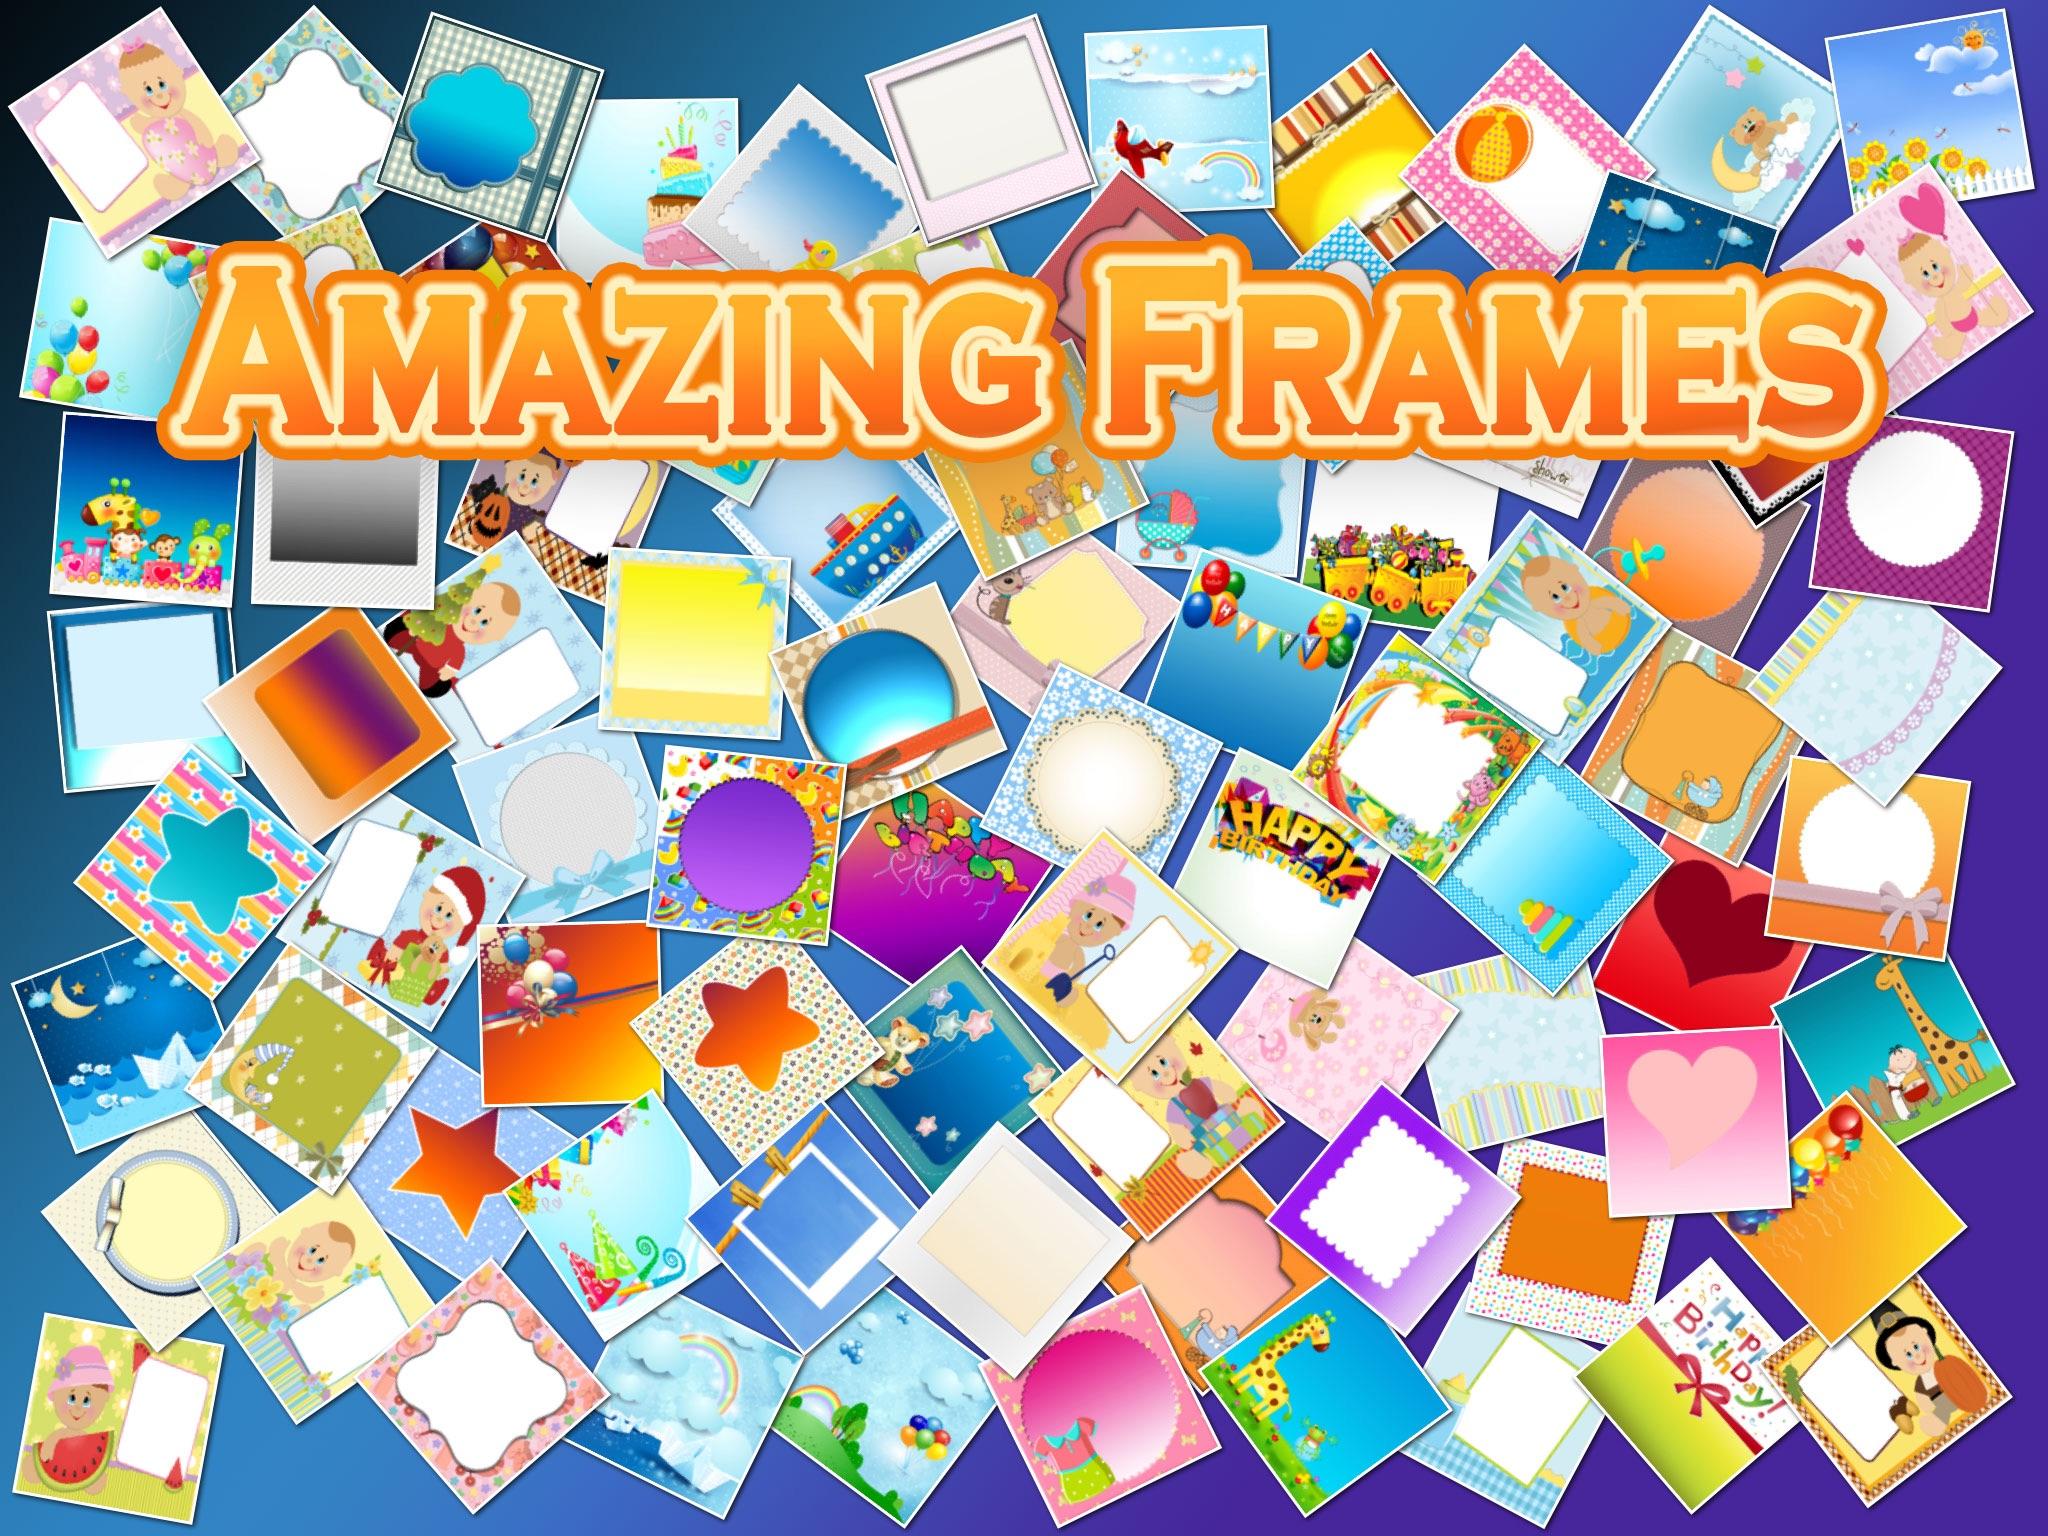 Baby Frames (HD) Screenshot